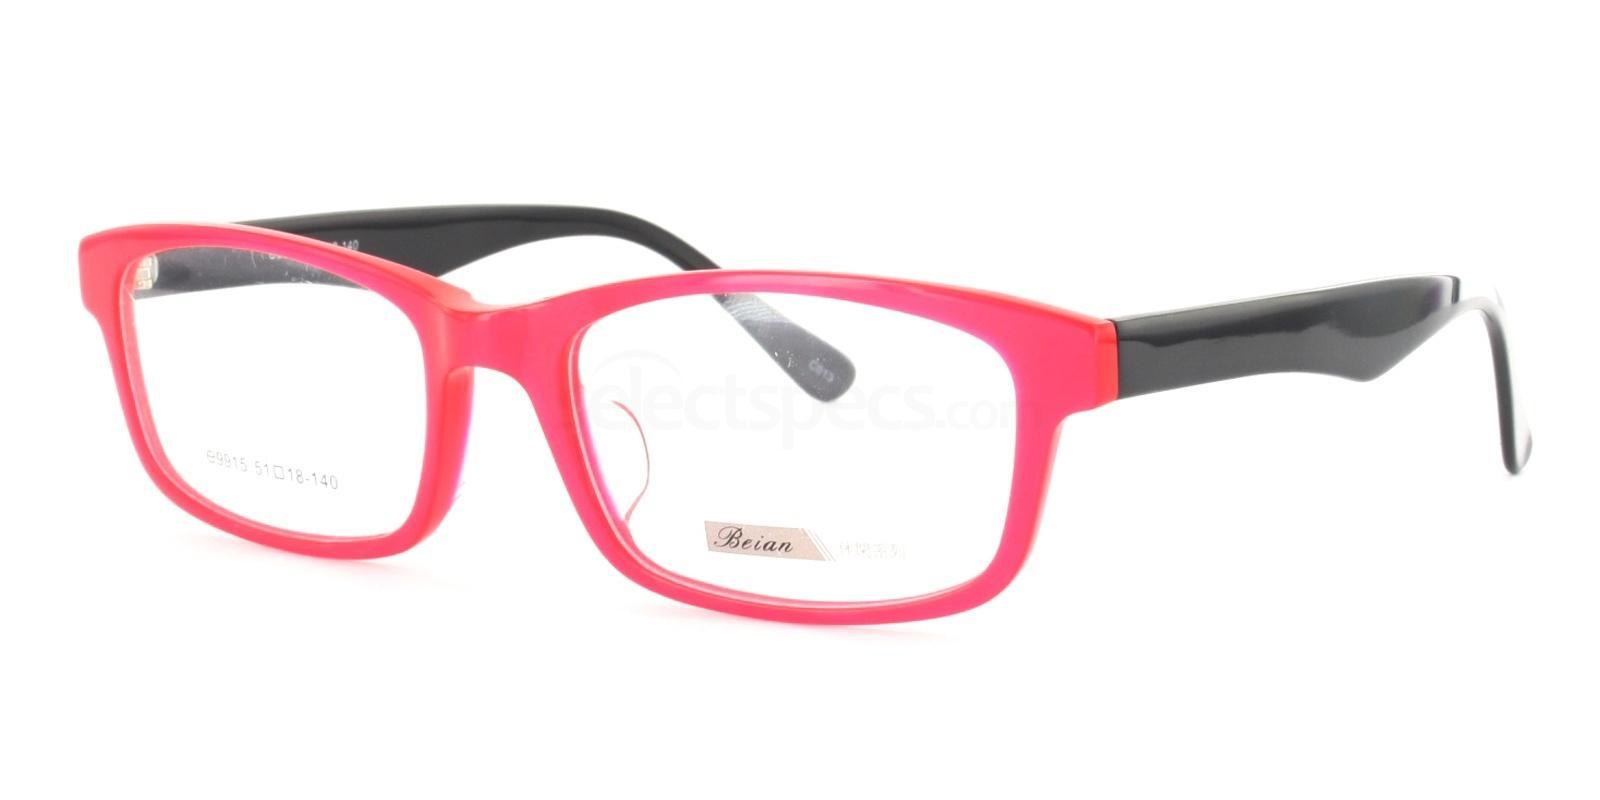 C013 A9915 Glasses, SelectSpecs